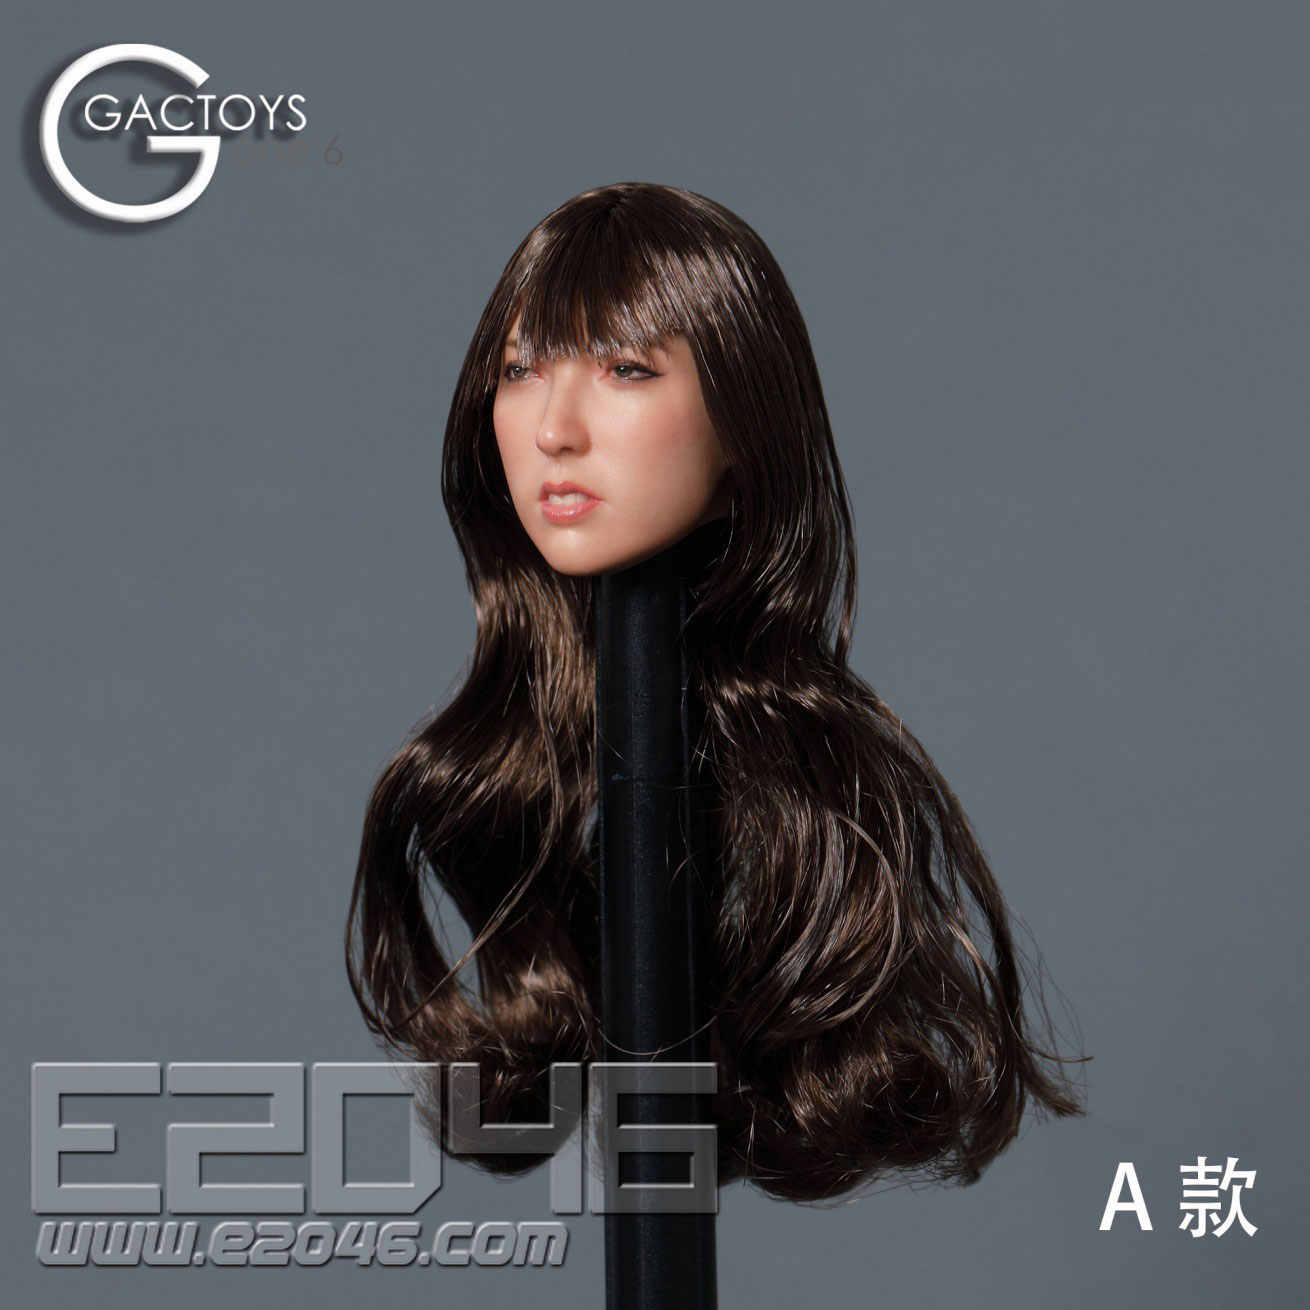 Asian Classic Head Sculpture A (DOLL)